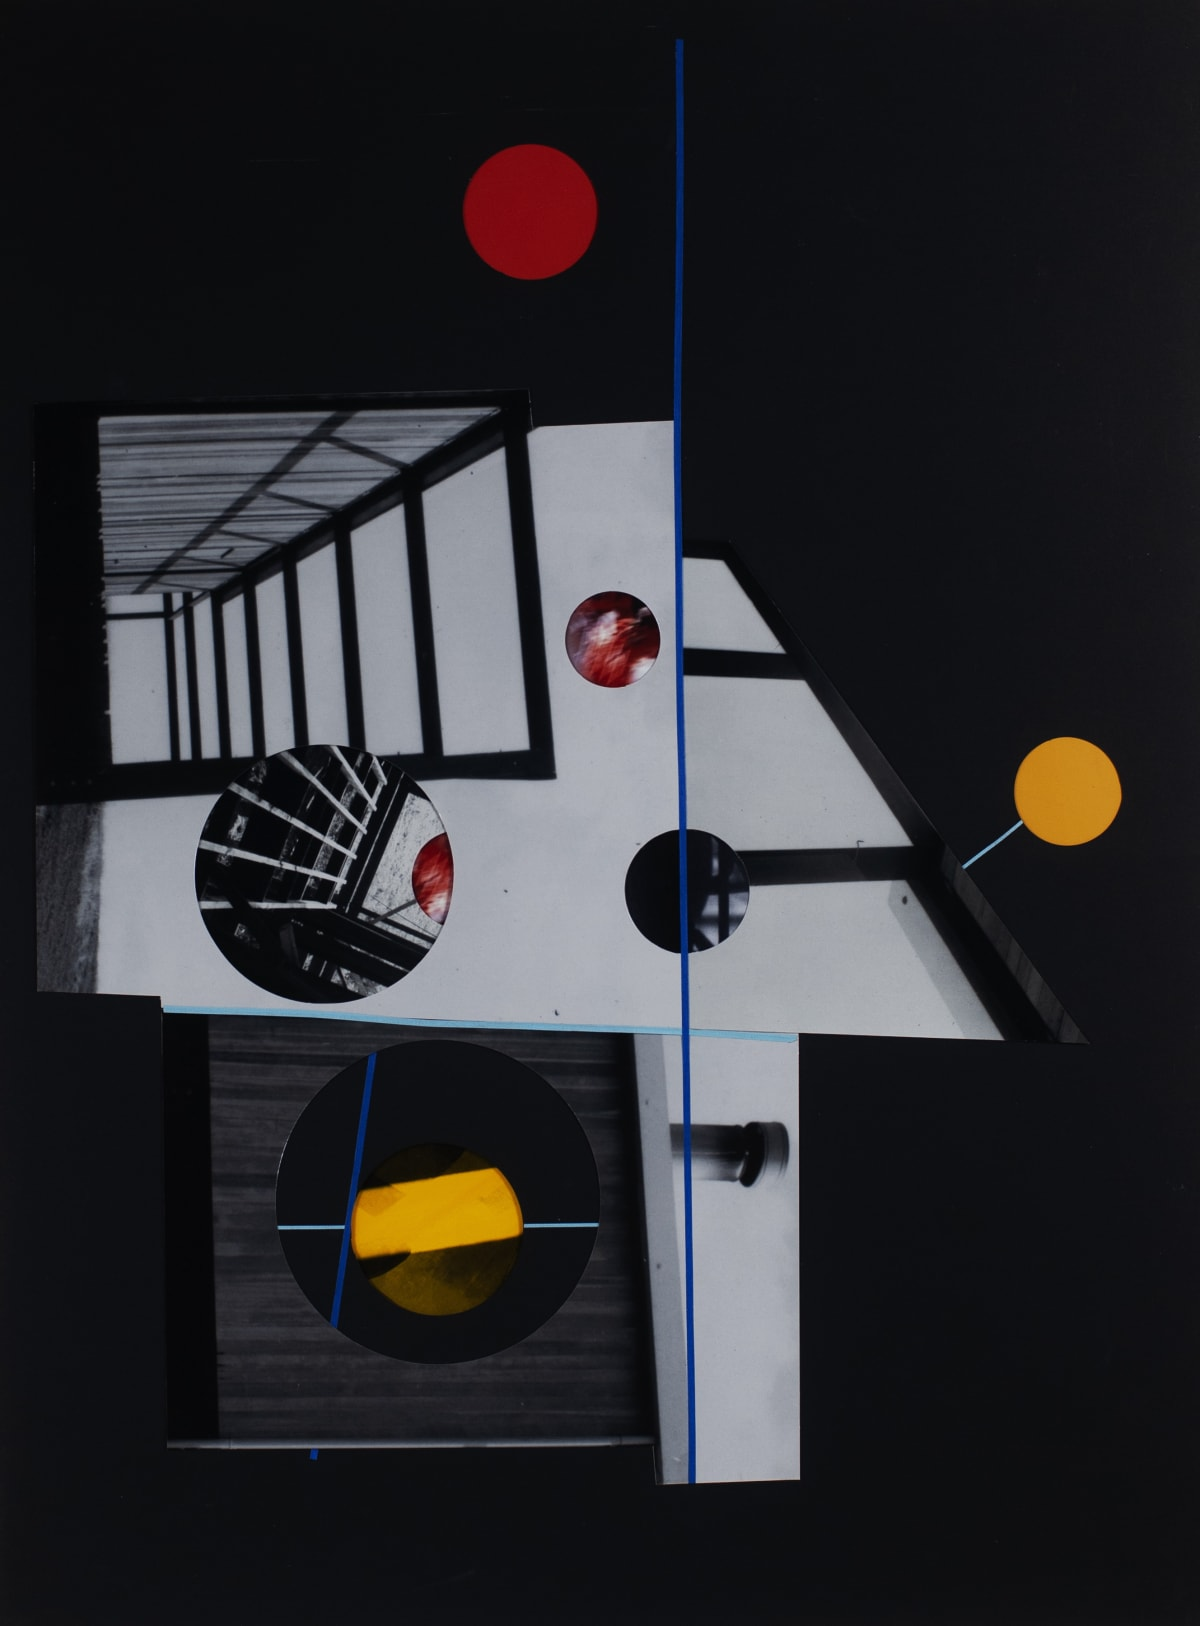 Bara Jichova Tyson, The Hatch House 5, 2014